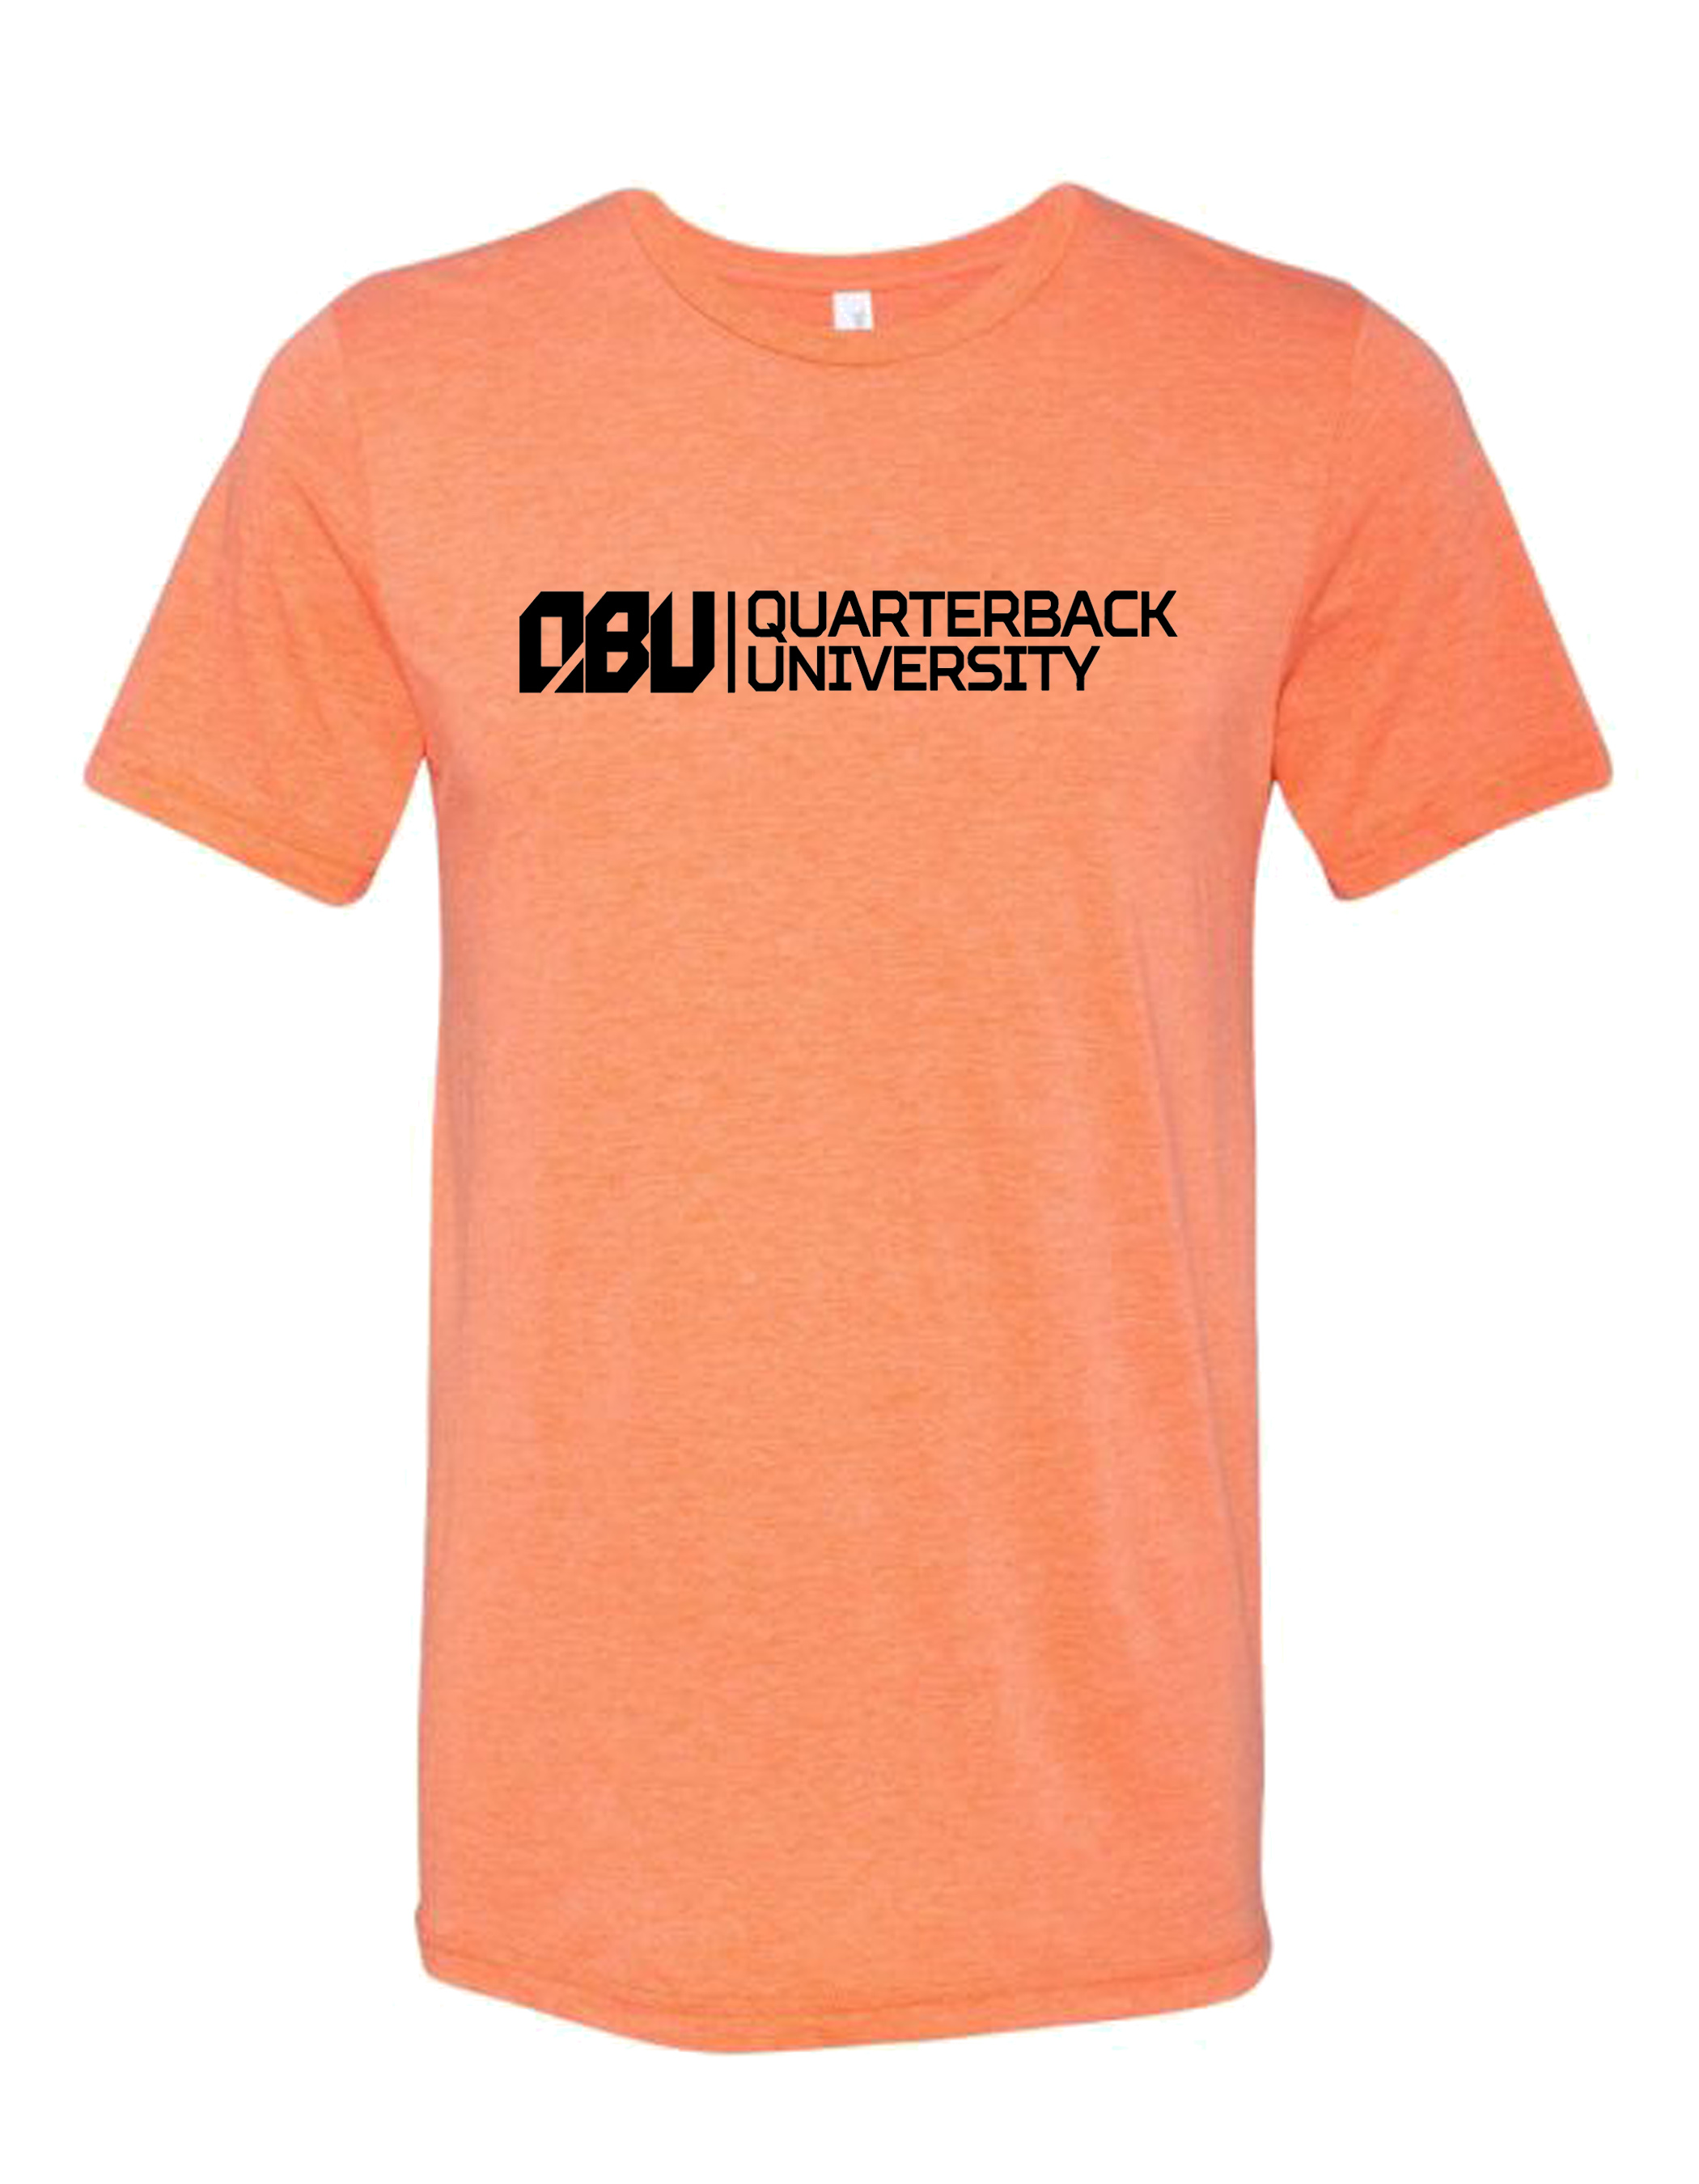 Quarterback University Tee Orange